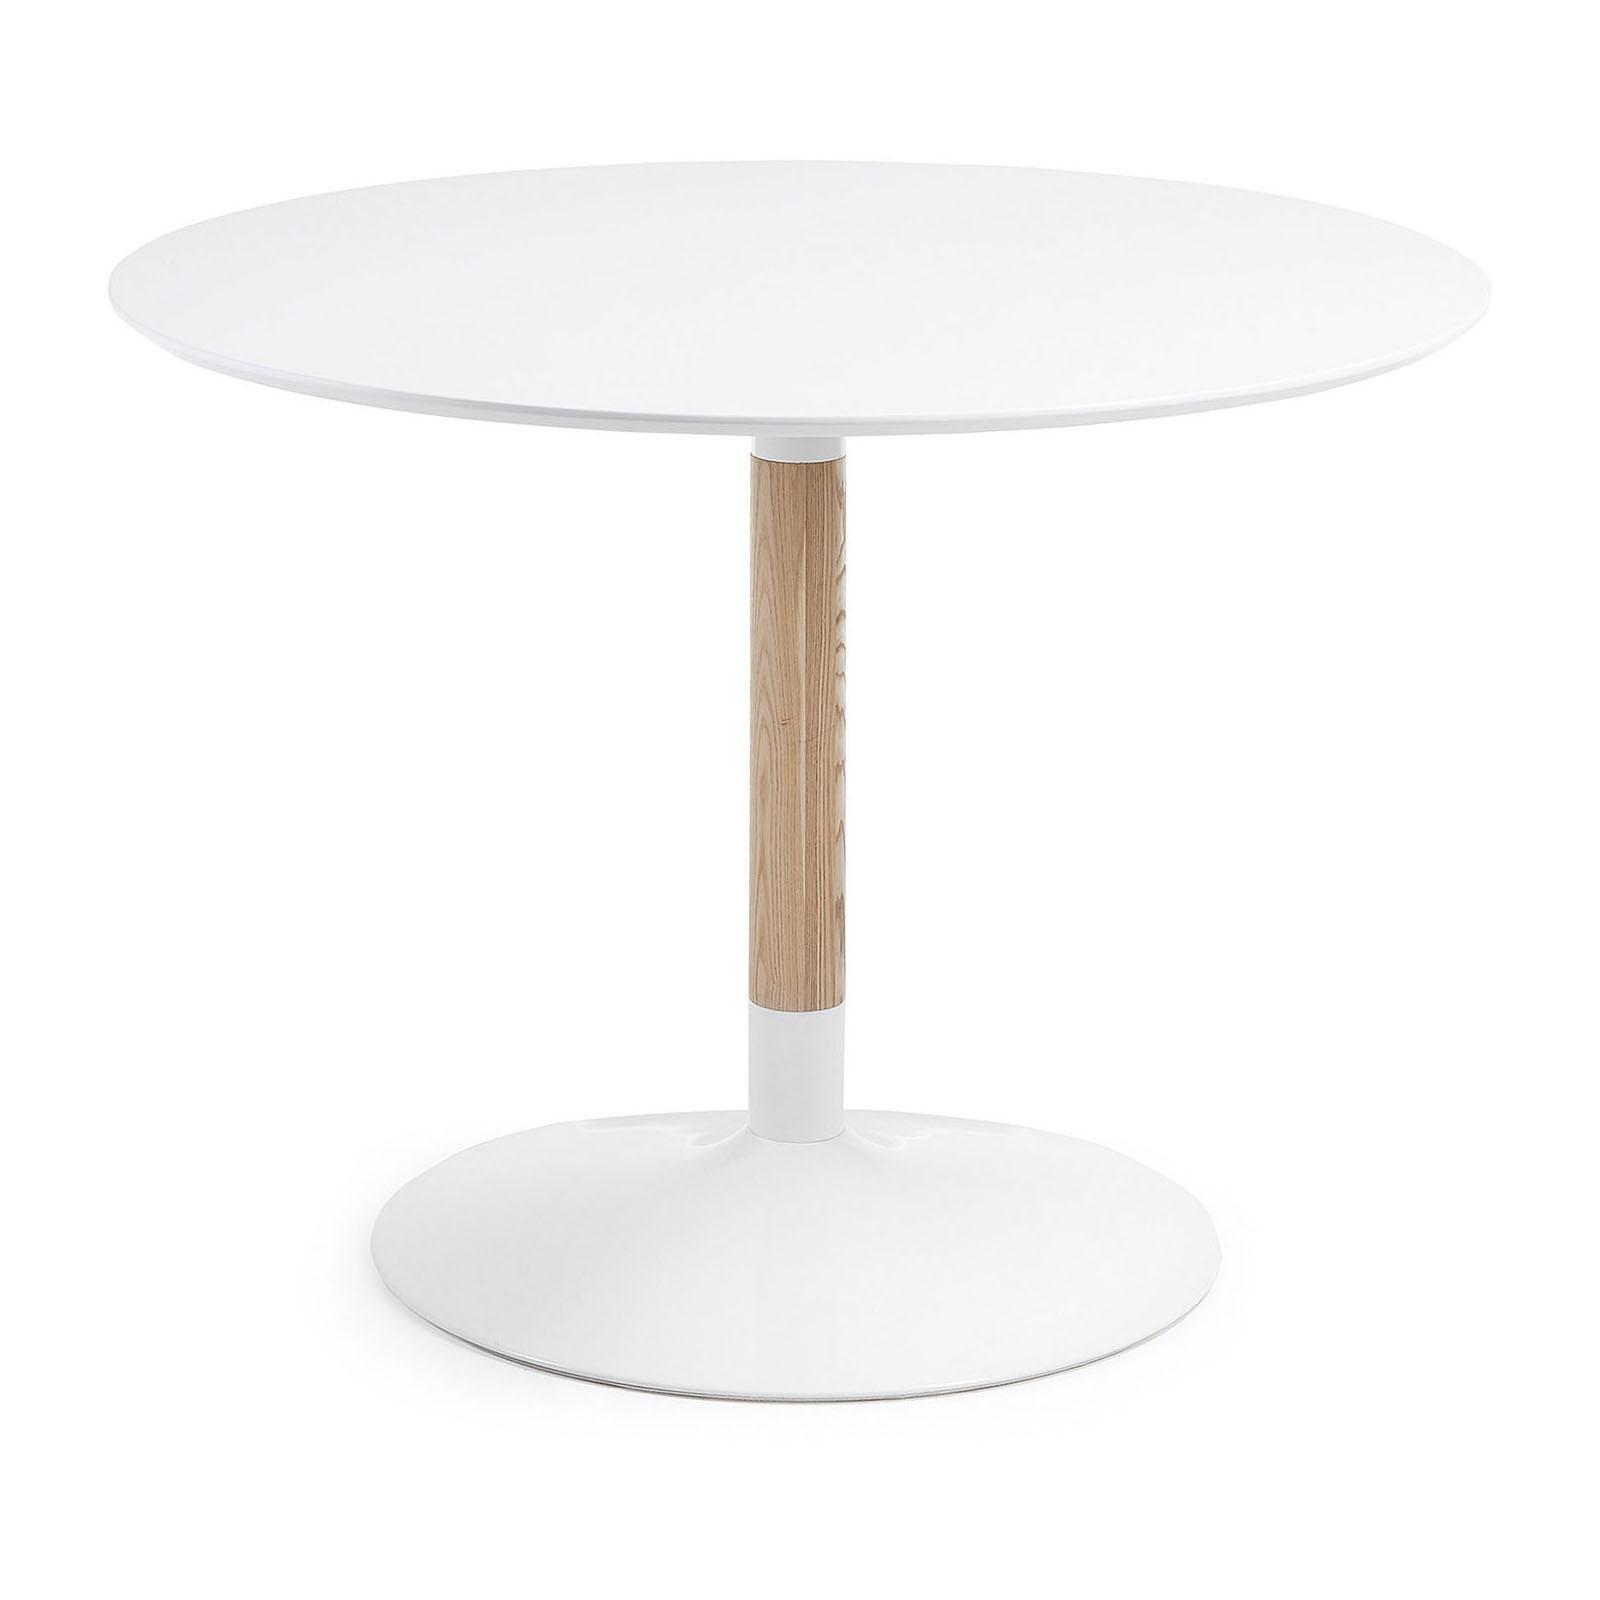 Castillo Round Dining Table, 110cm, White